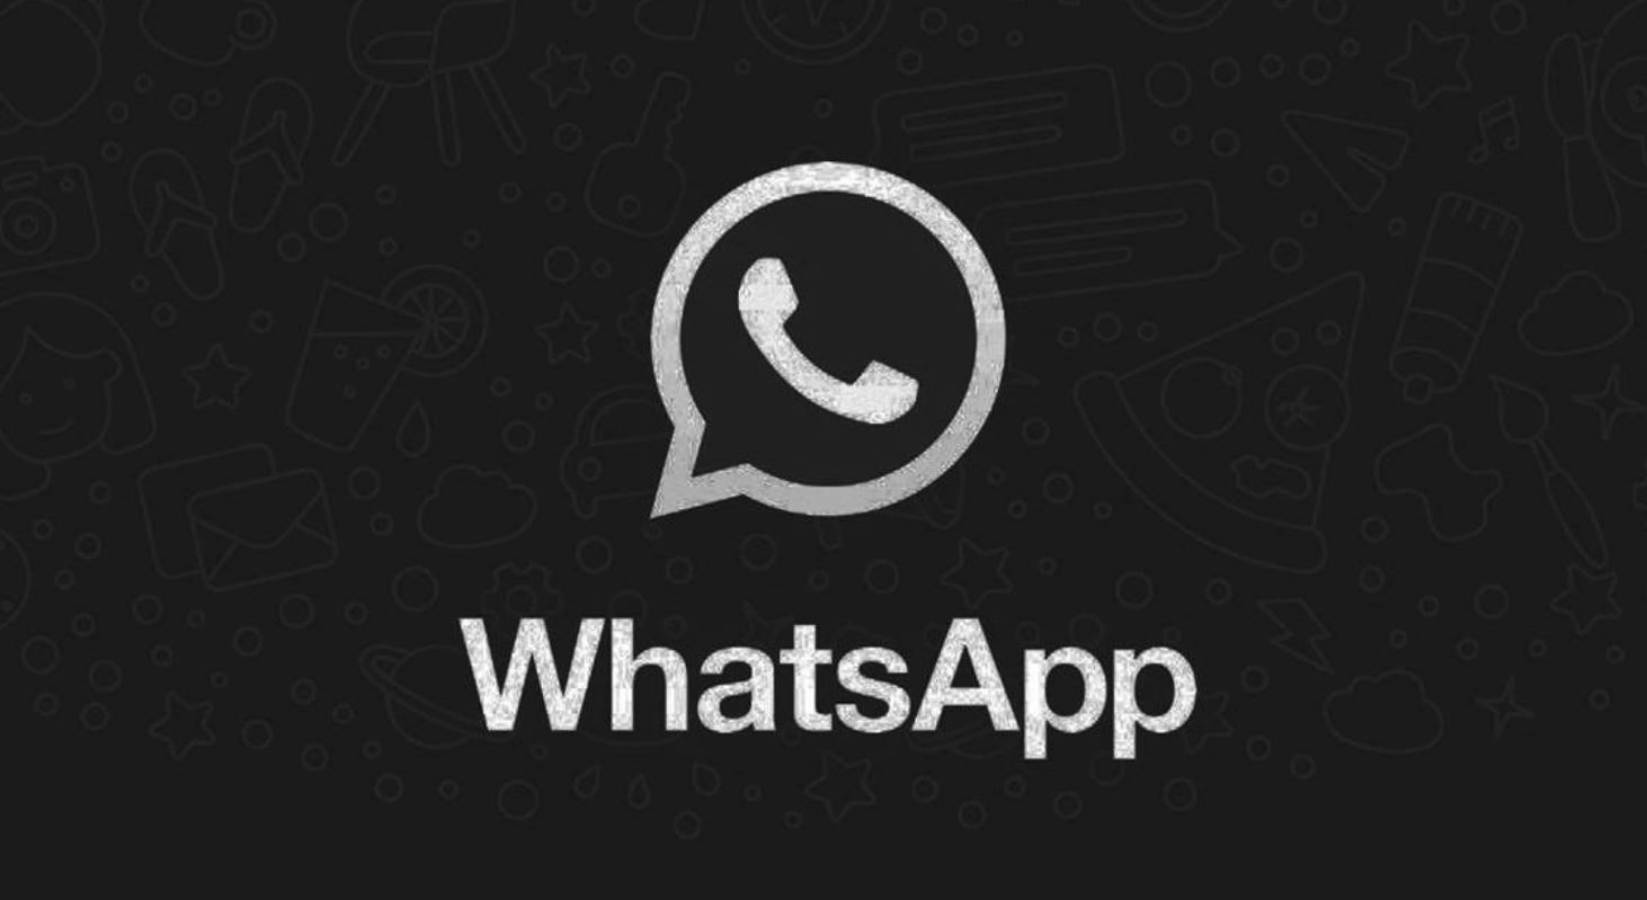 WhatsApp veste proasta dark mode